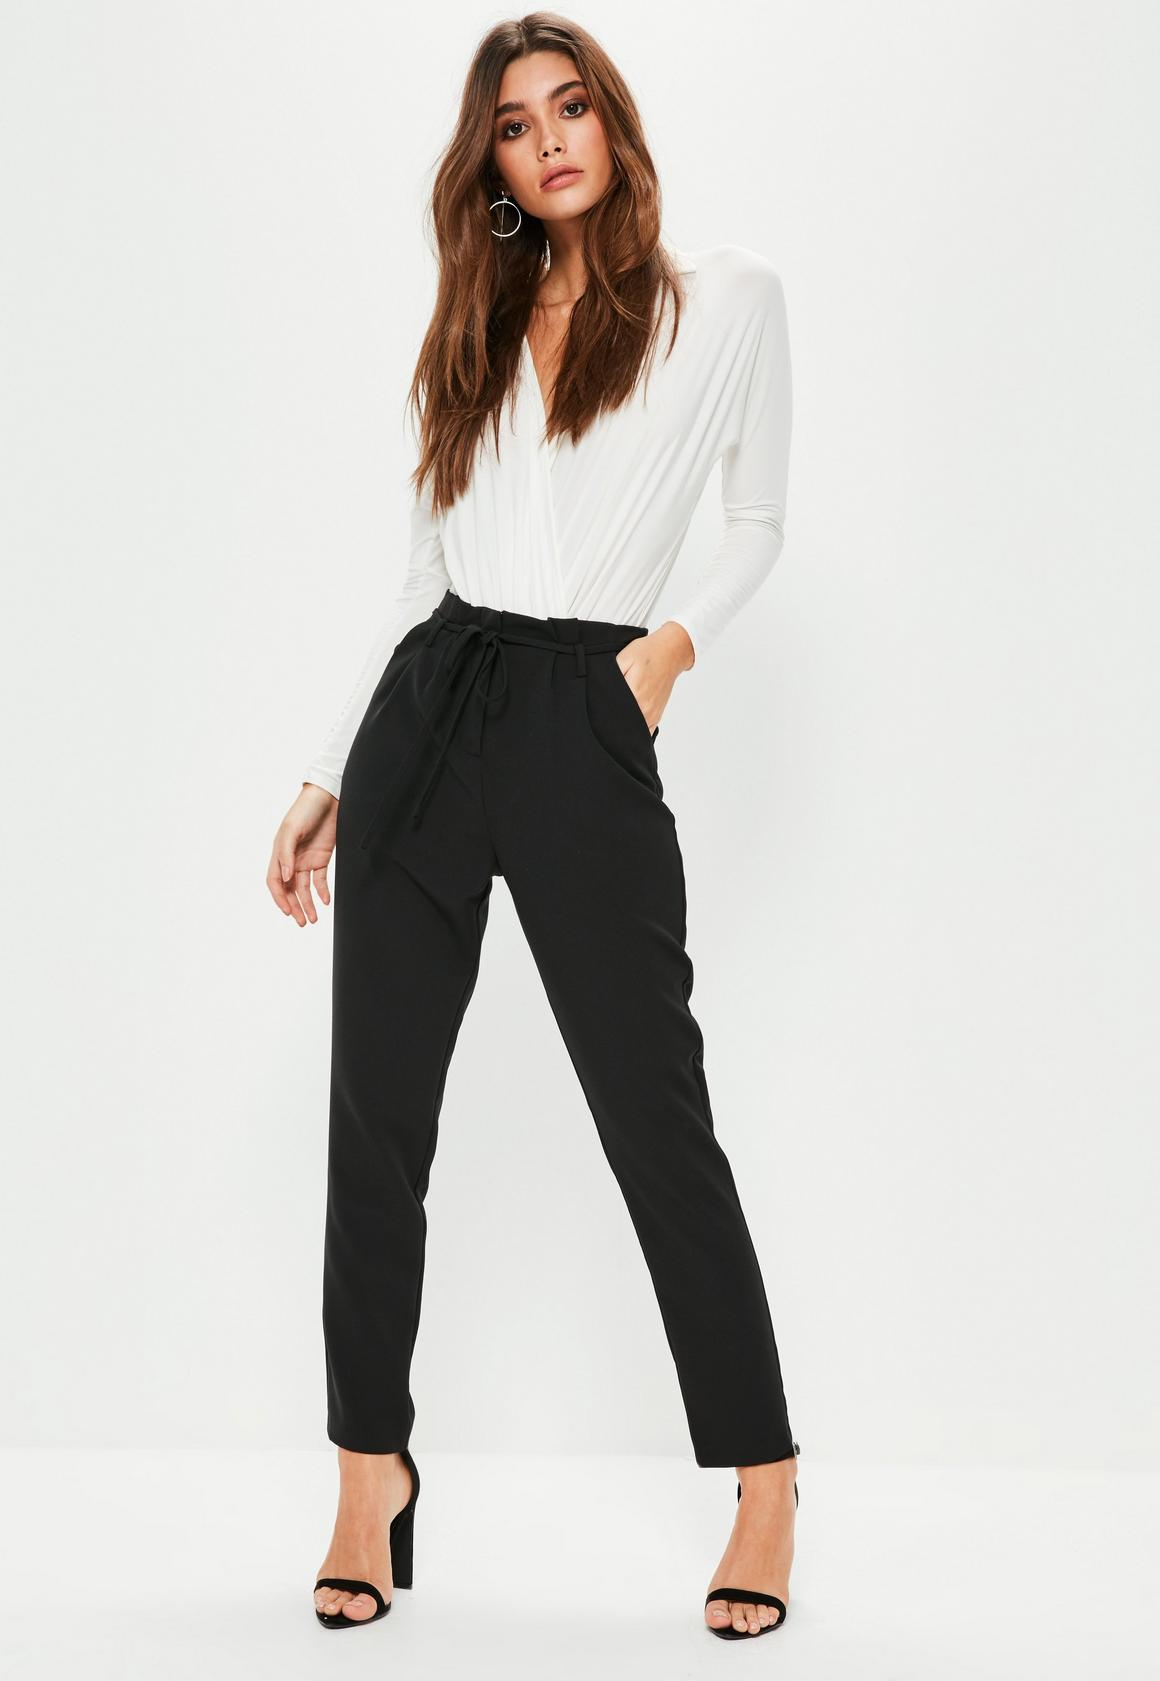 Paper bag trousers - Black Paperbag Waist Tie Detail Cigarette Trousers Previous Next